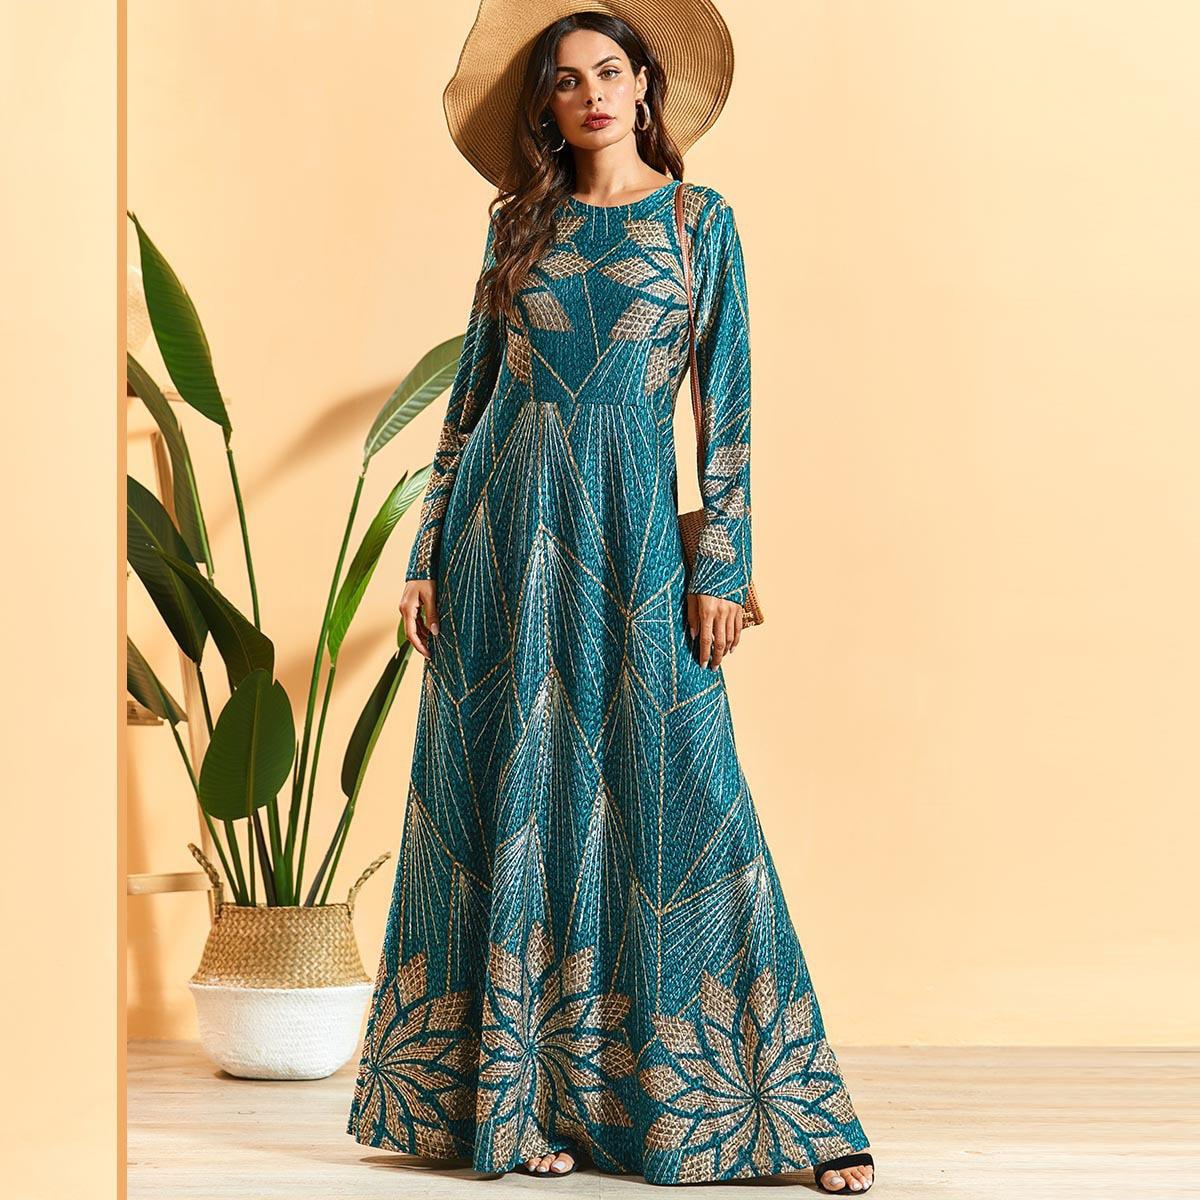 Ramadán Turquía musulmán Abaya mujeres vestido hijab imprimir UAE manga larga marroquí Kaftan Djellaba Jilbab Vestidos ropa islámica